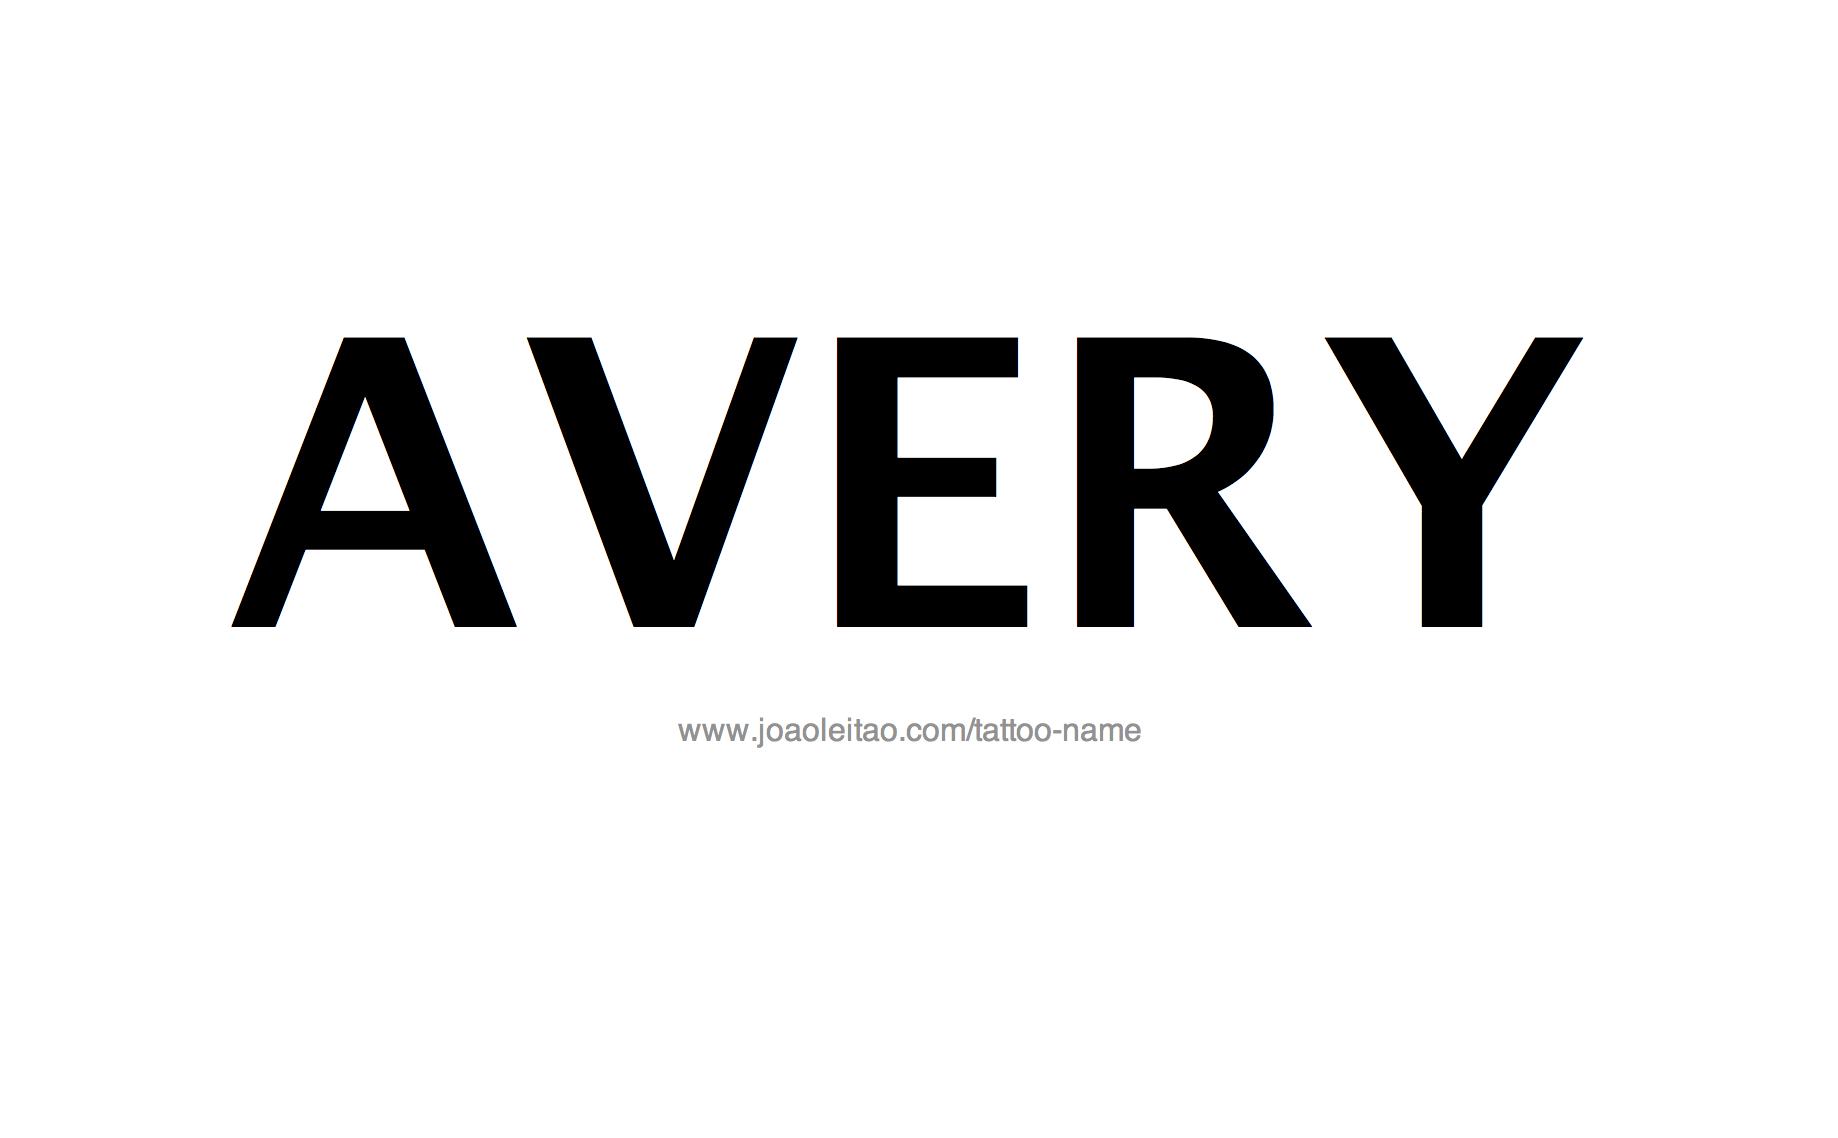 avery designs online